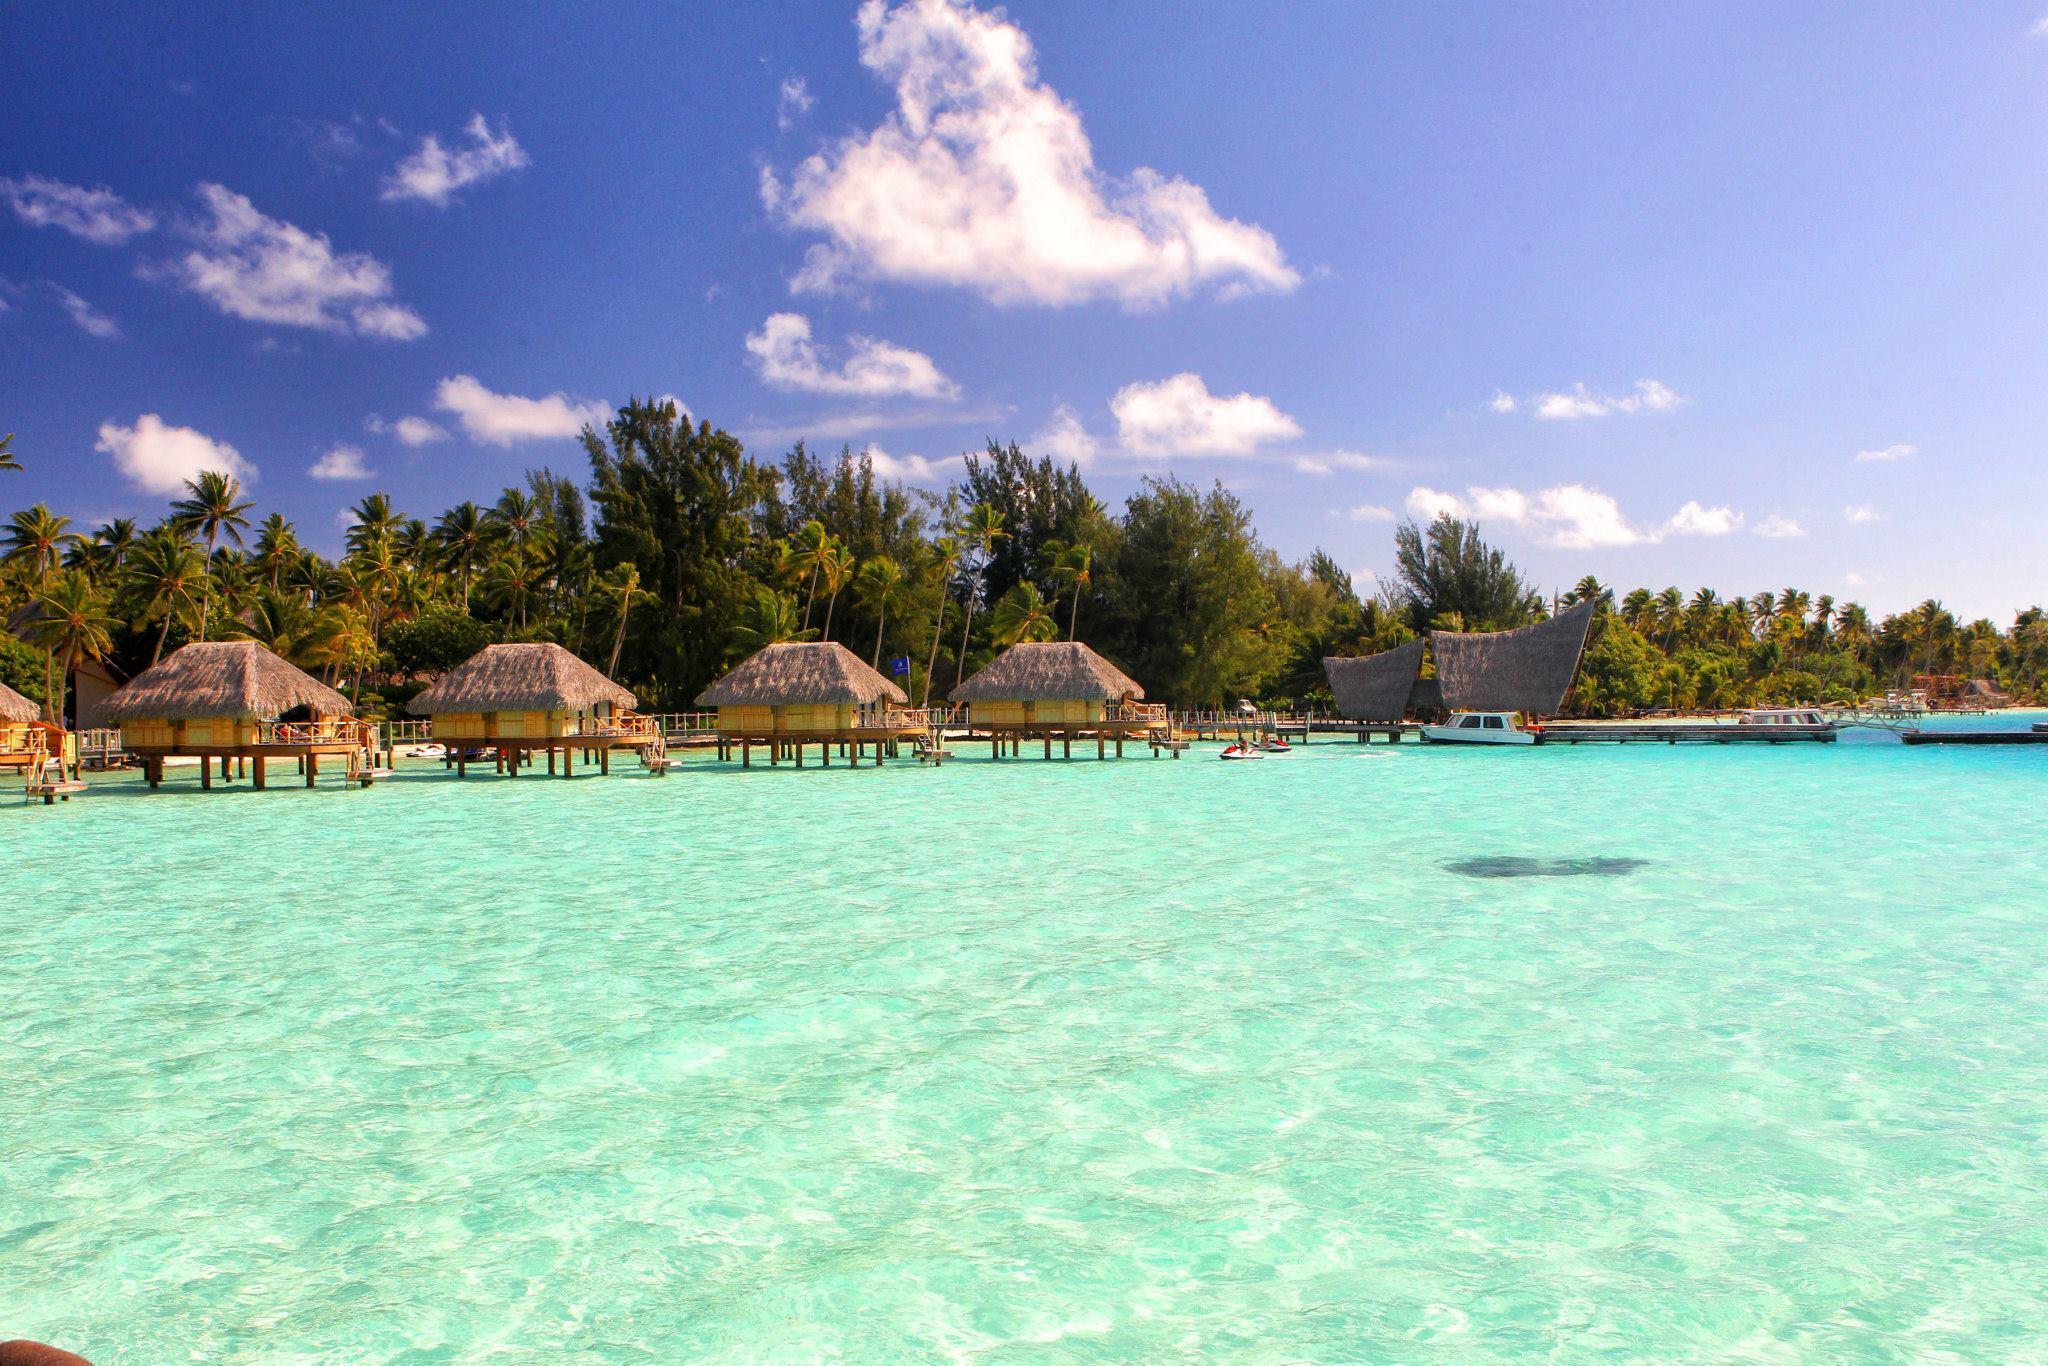 Magnificent Bora Bora Green Blue Lagoon Hd Wallpaper Wallpaper List 2048x1366